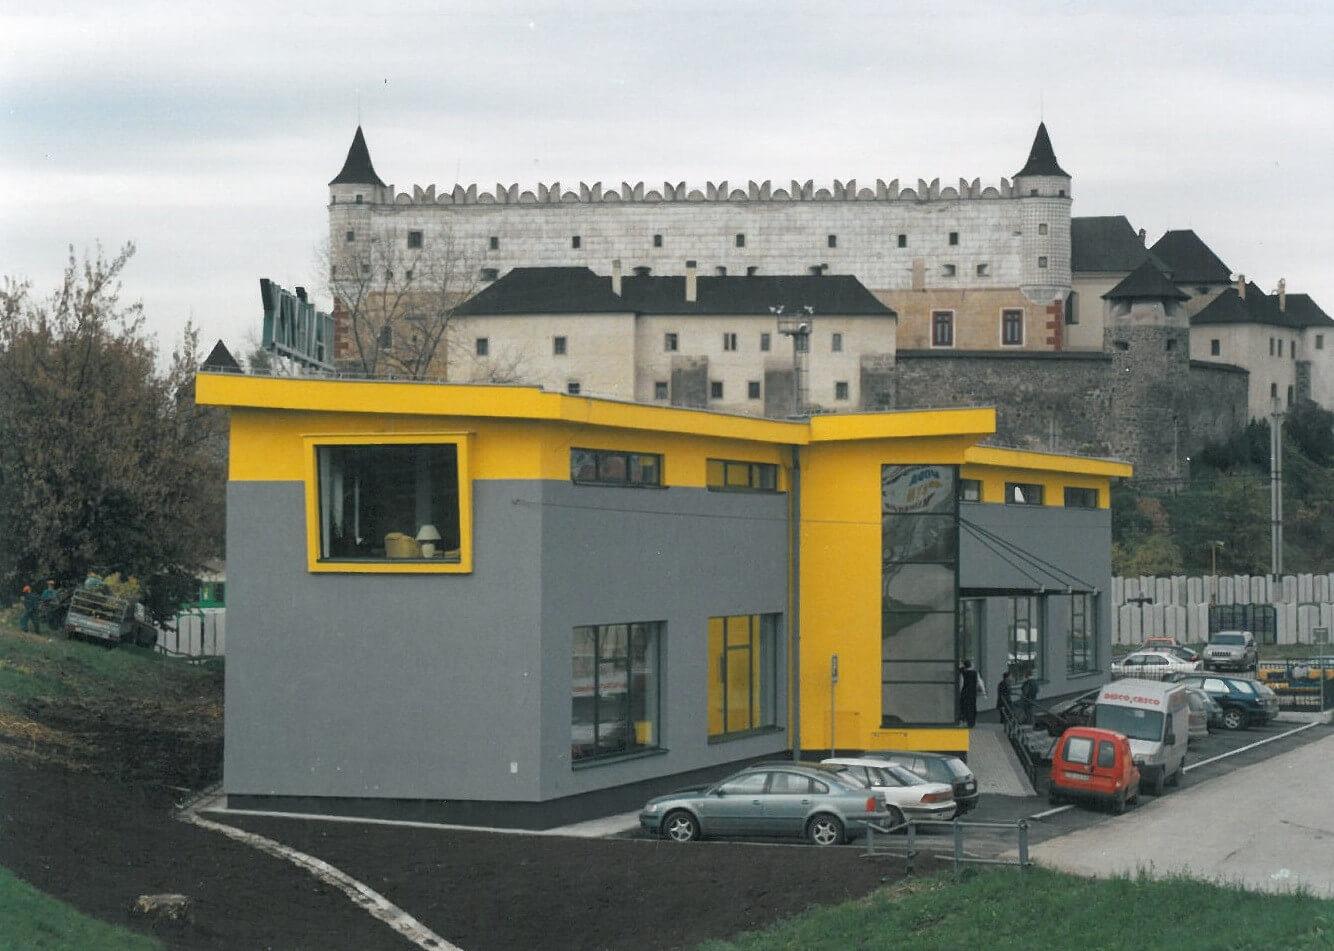 Otvorenie novo postavenej predajne vo Zvolene 2002